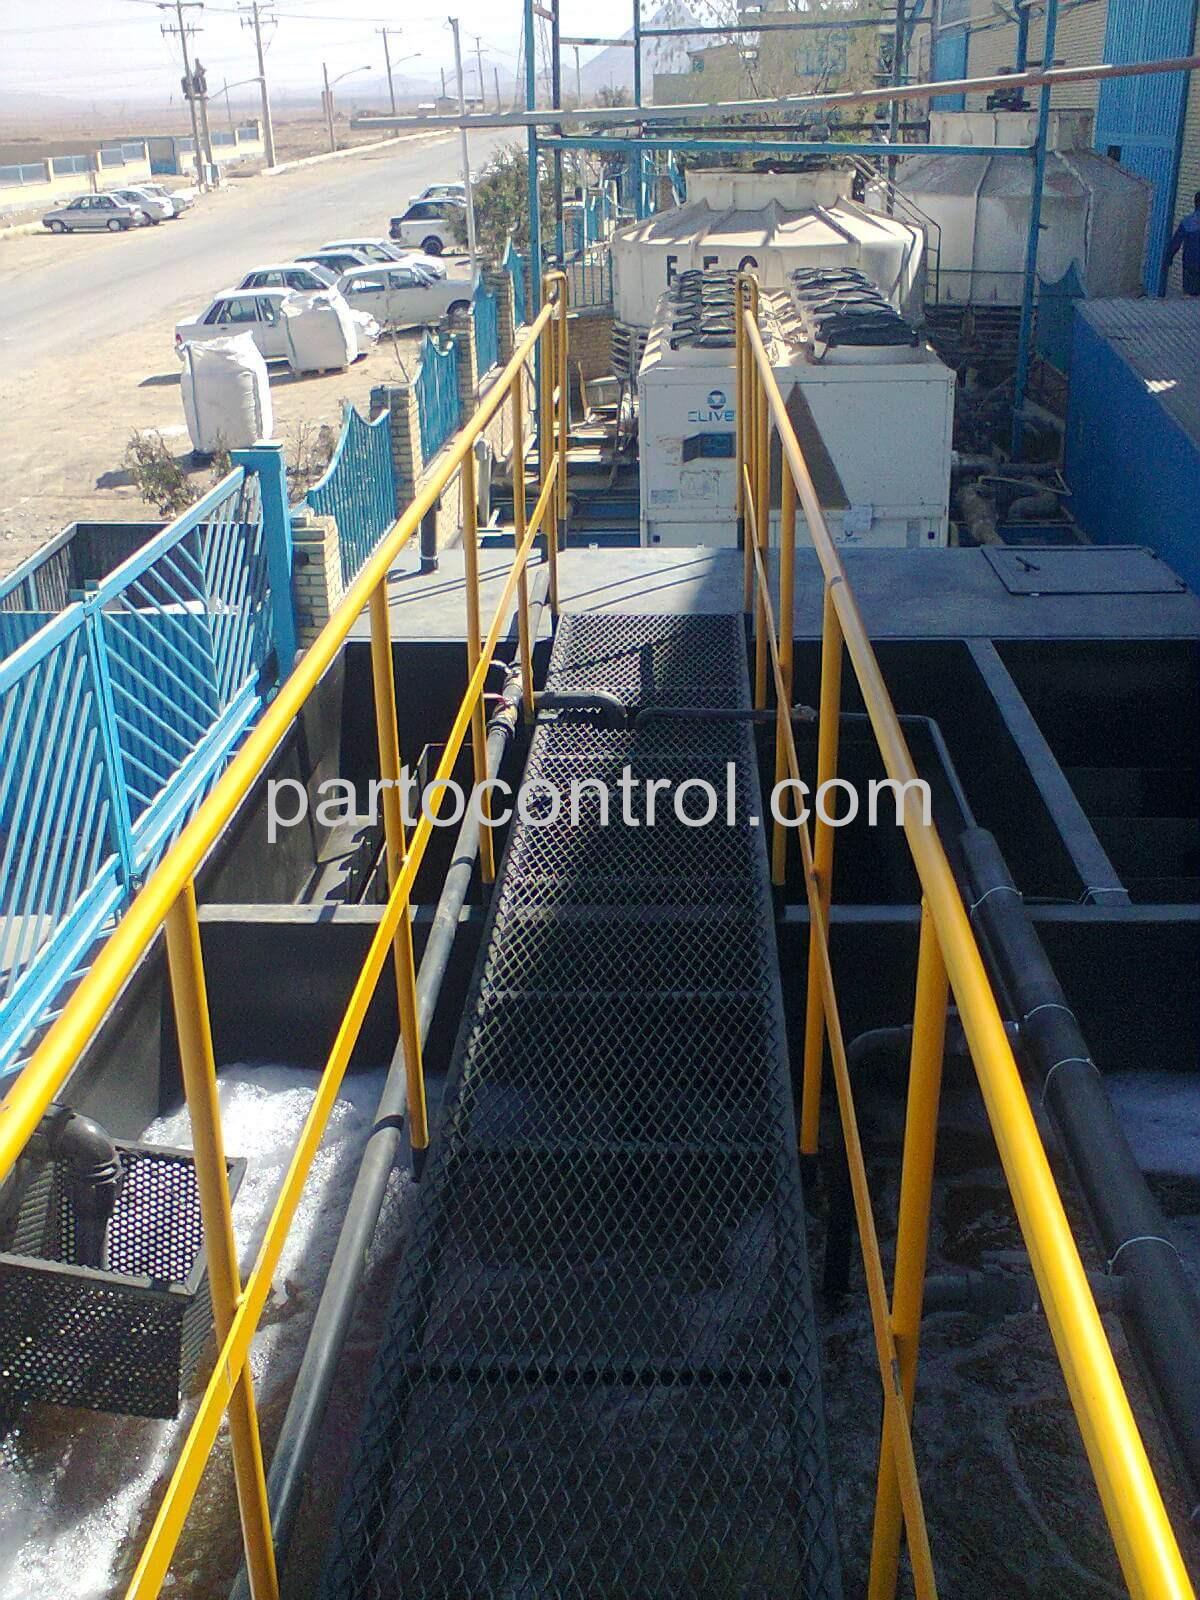 Carwash Sewage Treatment Packageتصفیه فاضلاب کارواش پلیمر گلپایگان6 - پروژه تصفیه فاضلاب کارواش